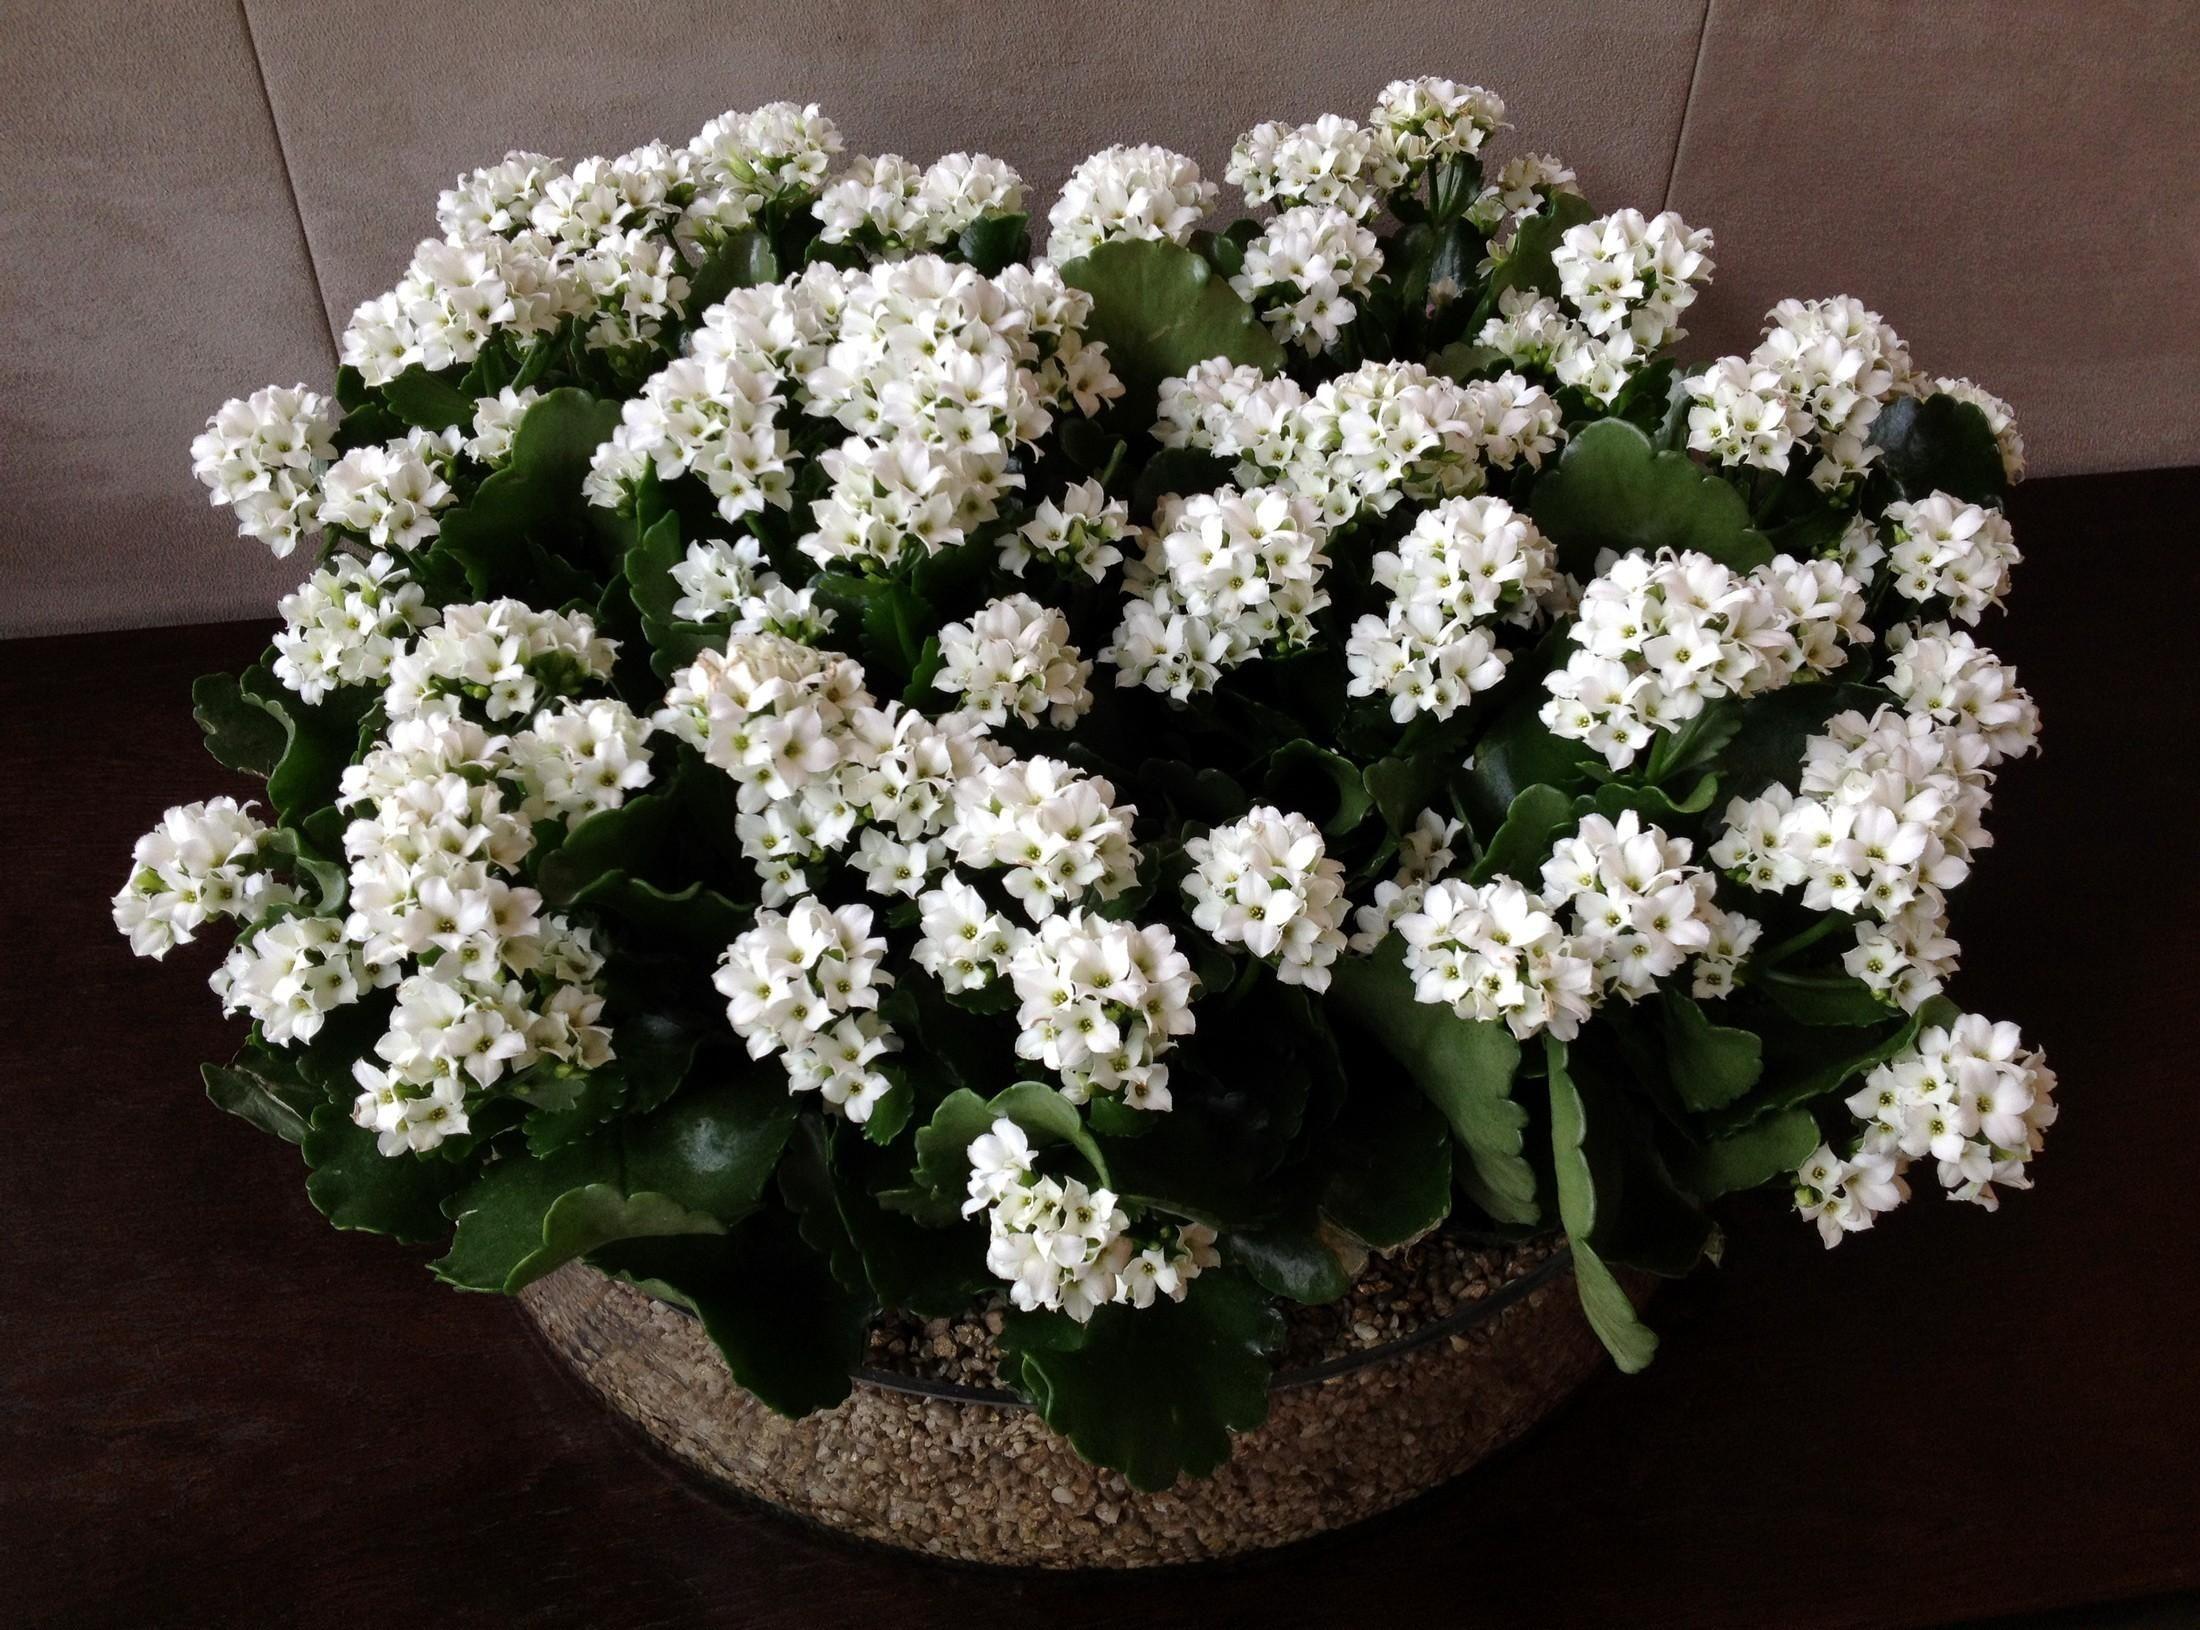 2200x1630 Wallpaper kalanchoe, flowers, white, indoor